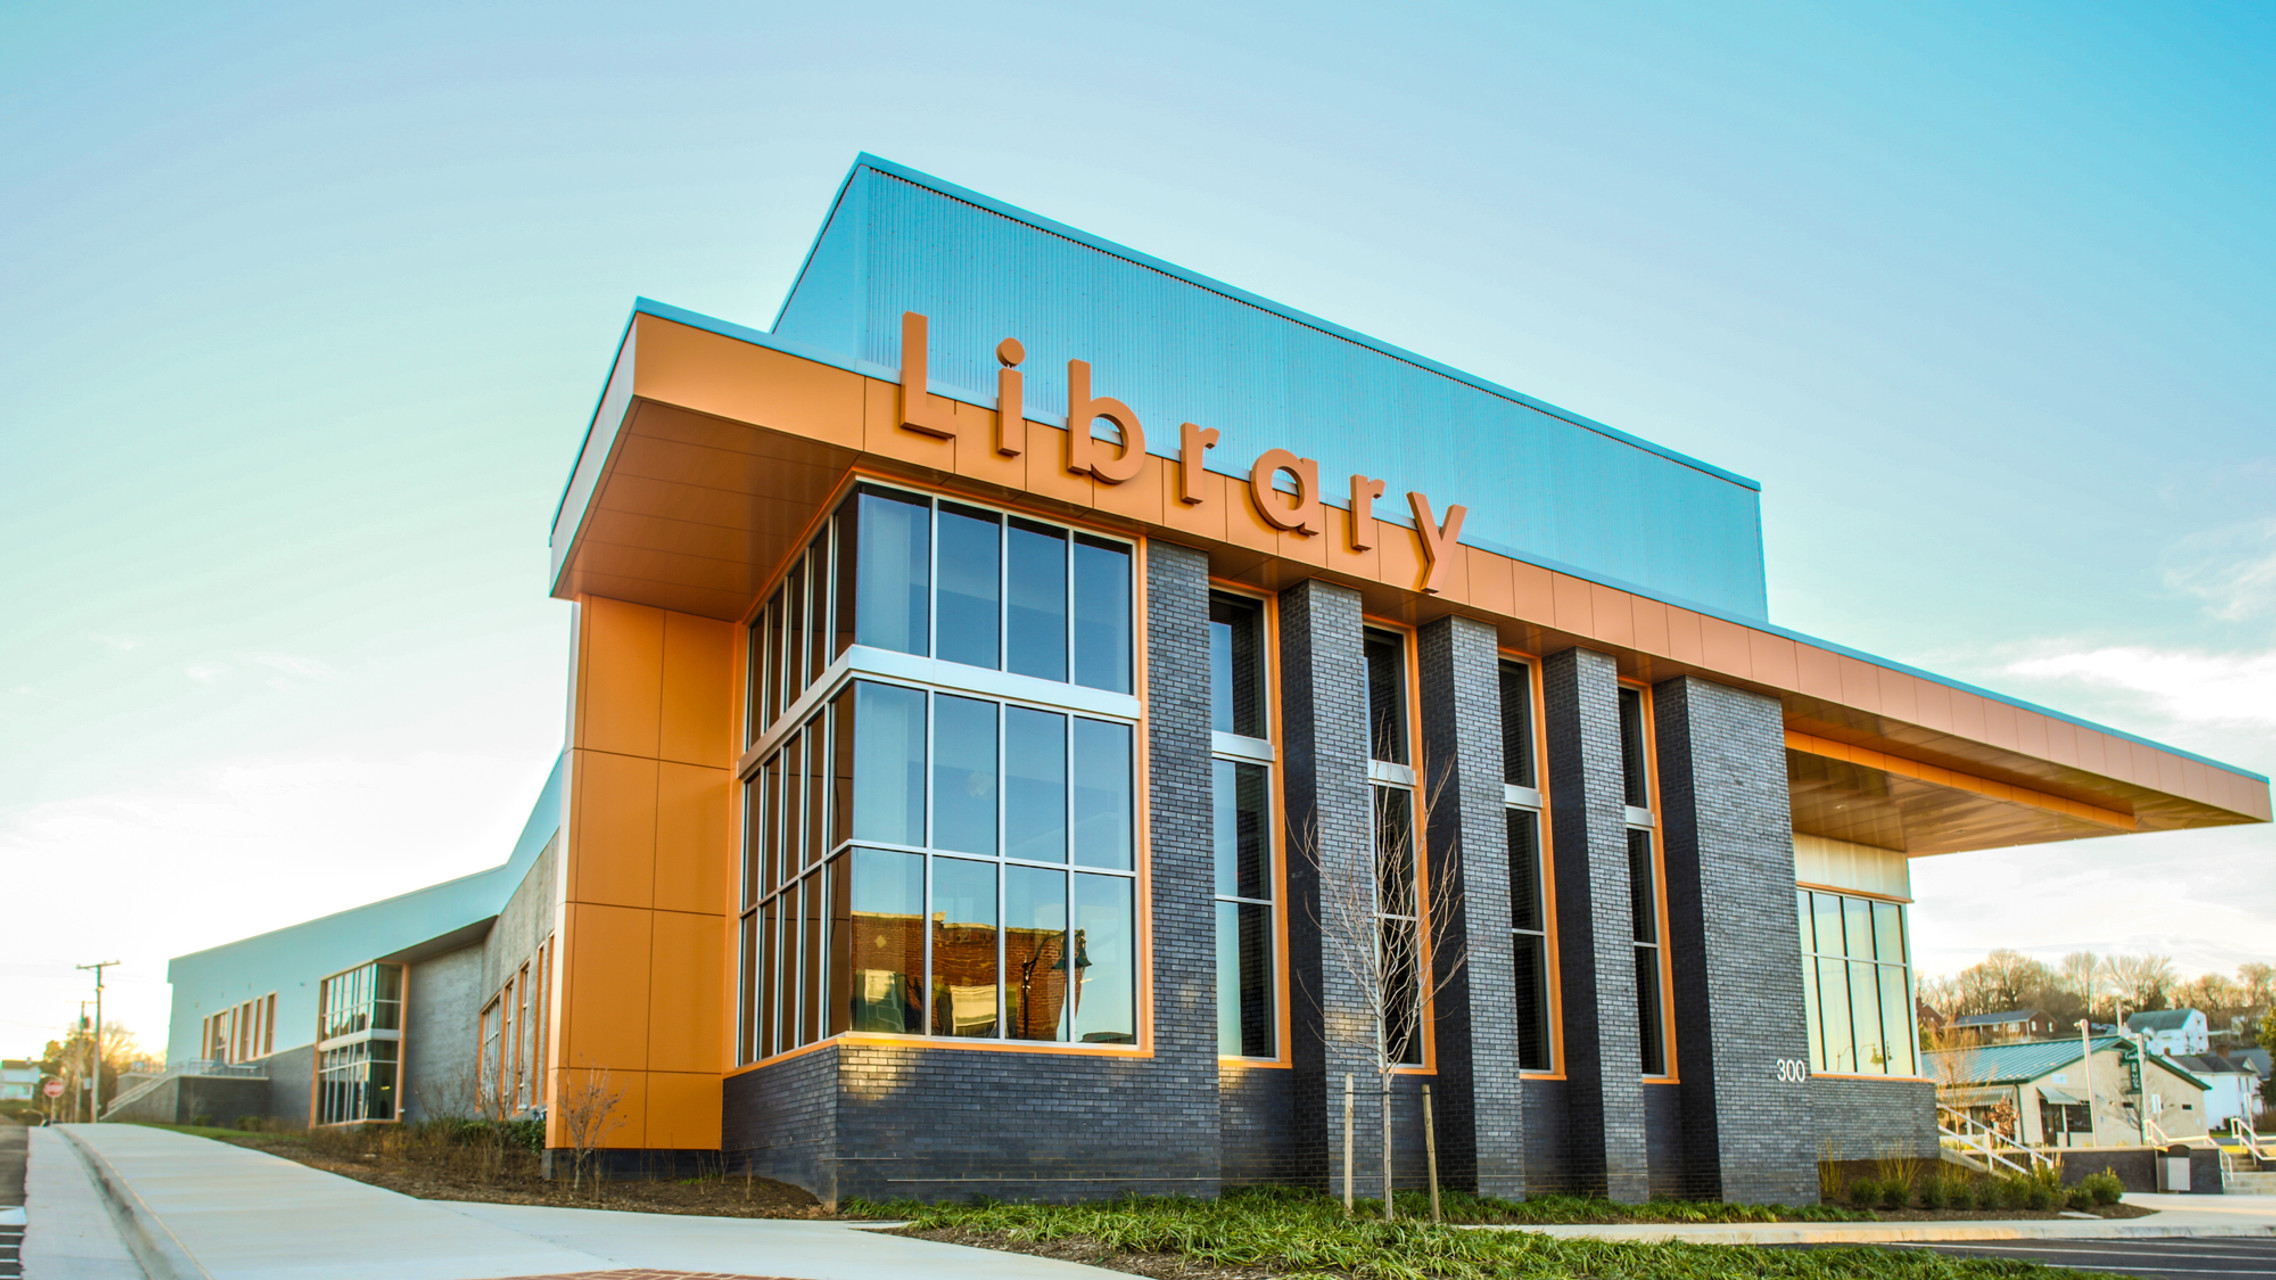 Oberbettingen hillesheim architectural products localbitcoins escrow fee california